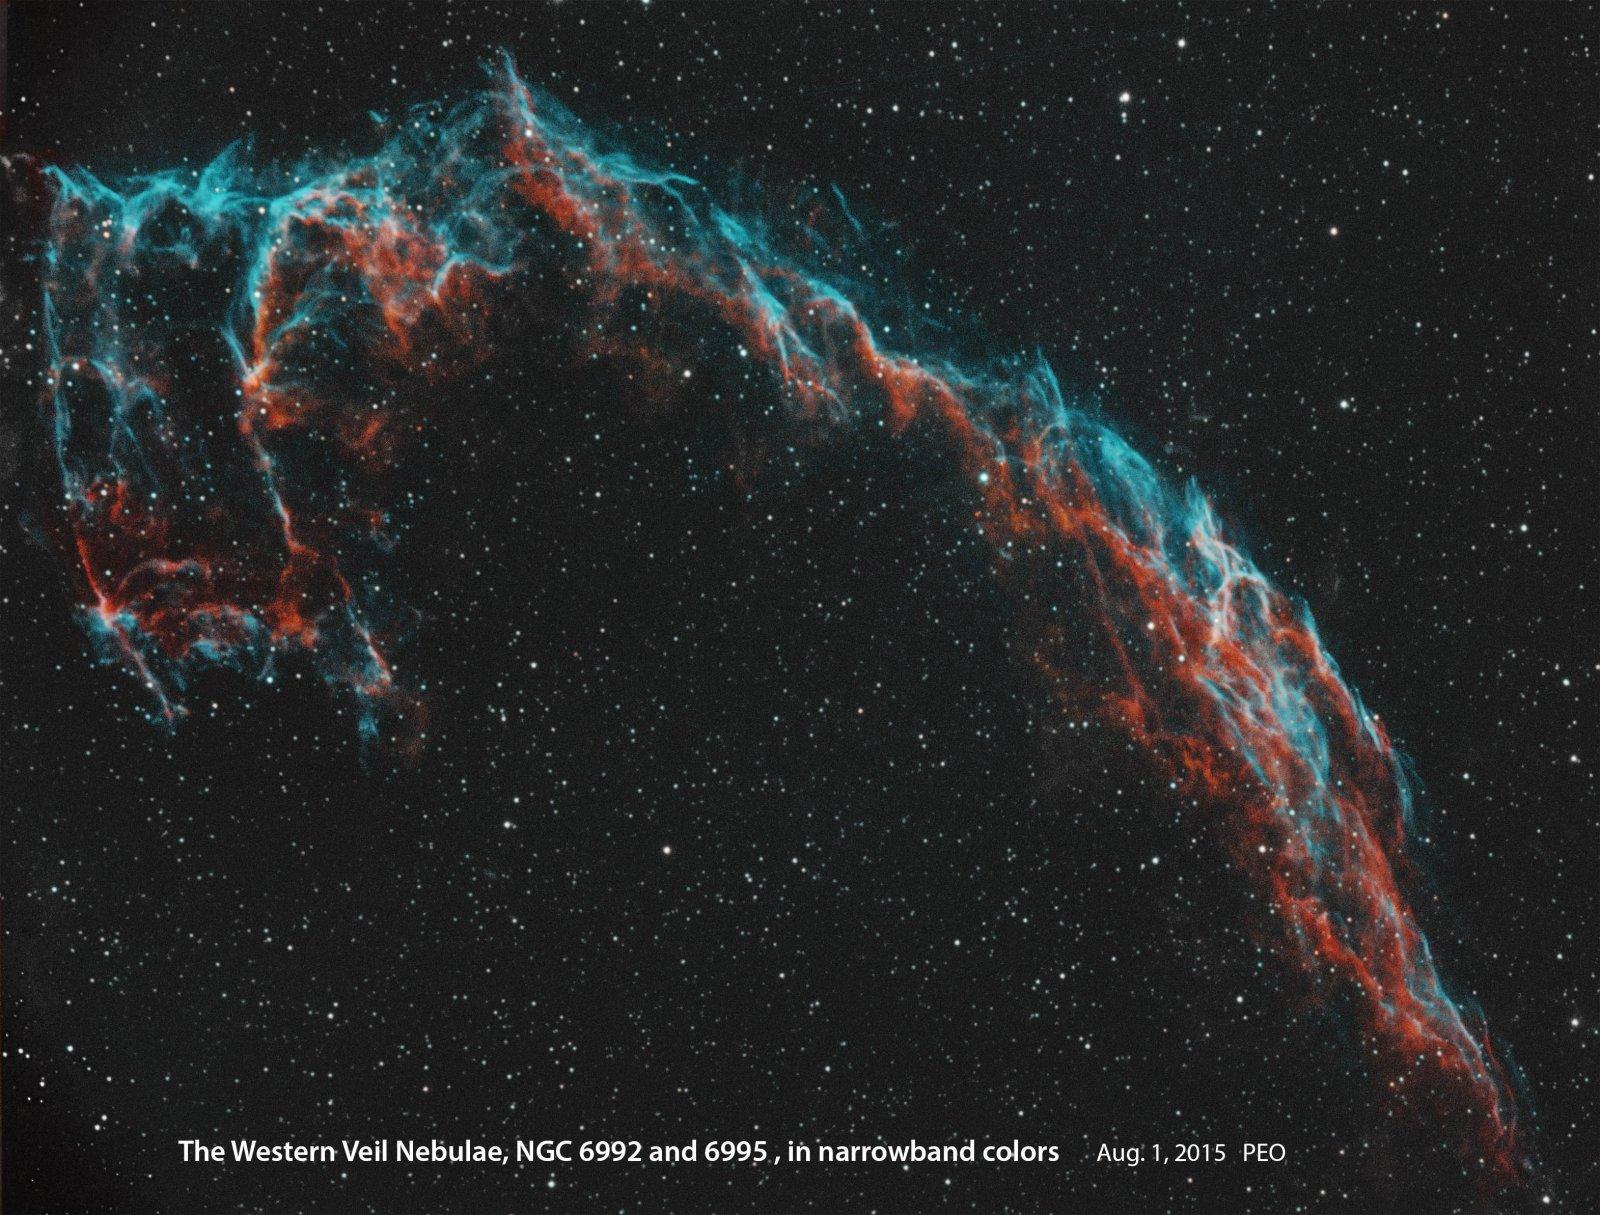 Wester Veil Nebula